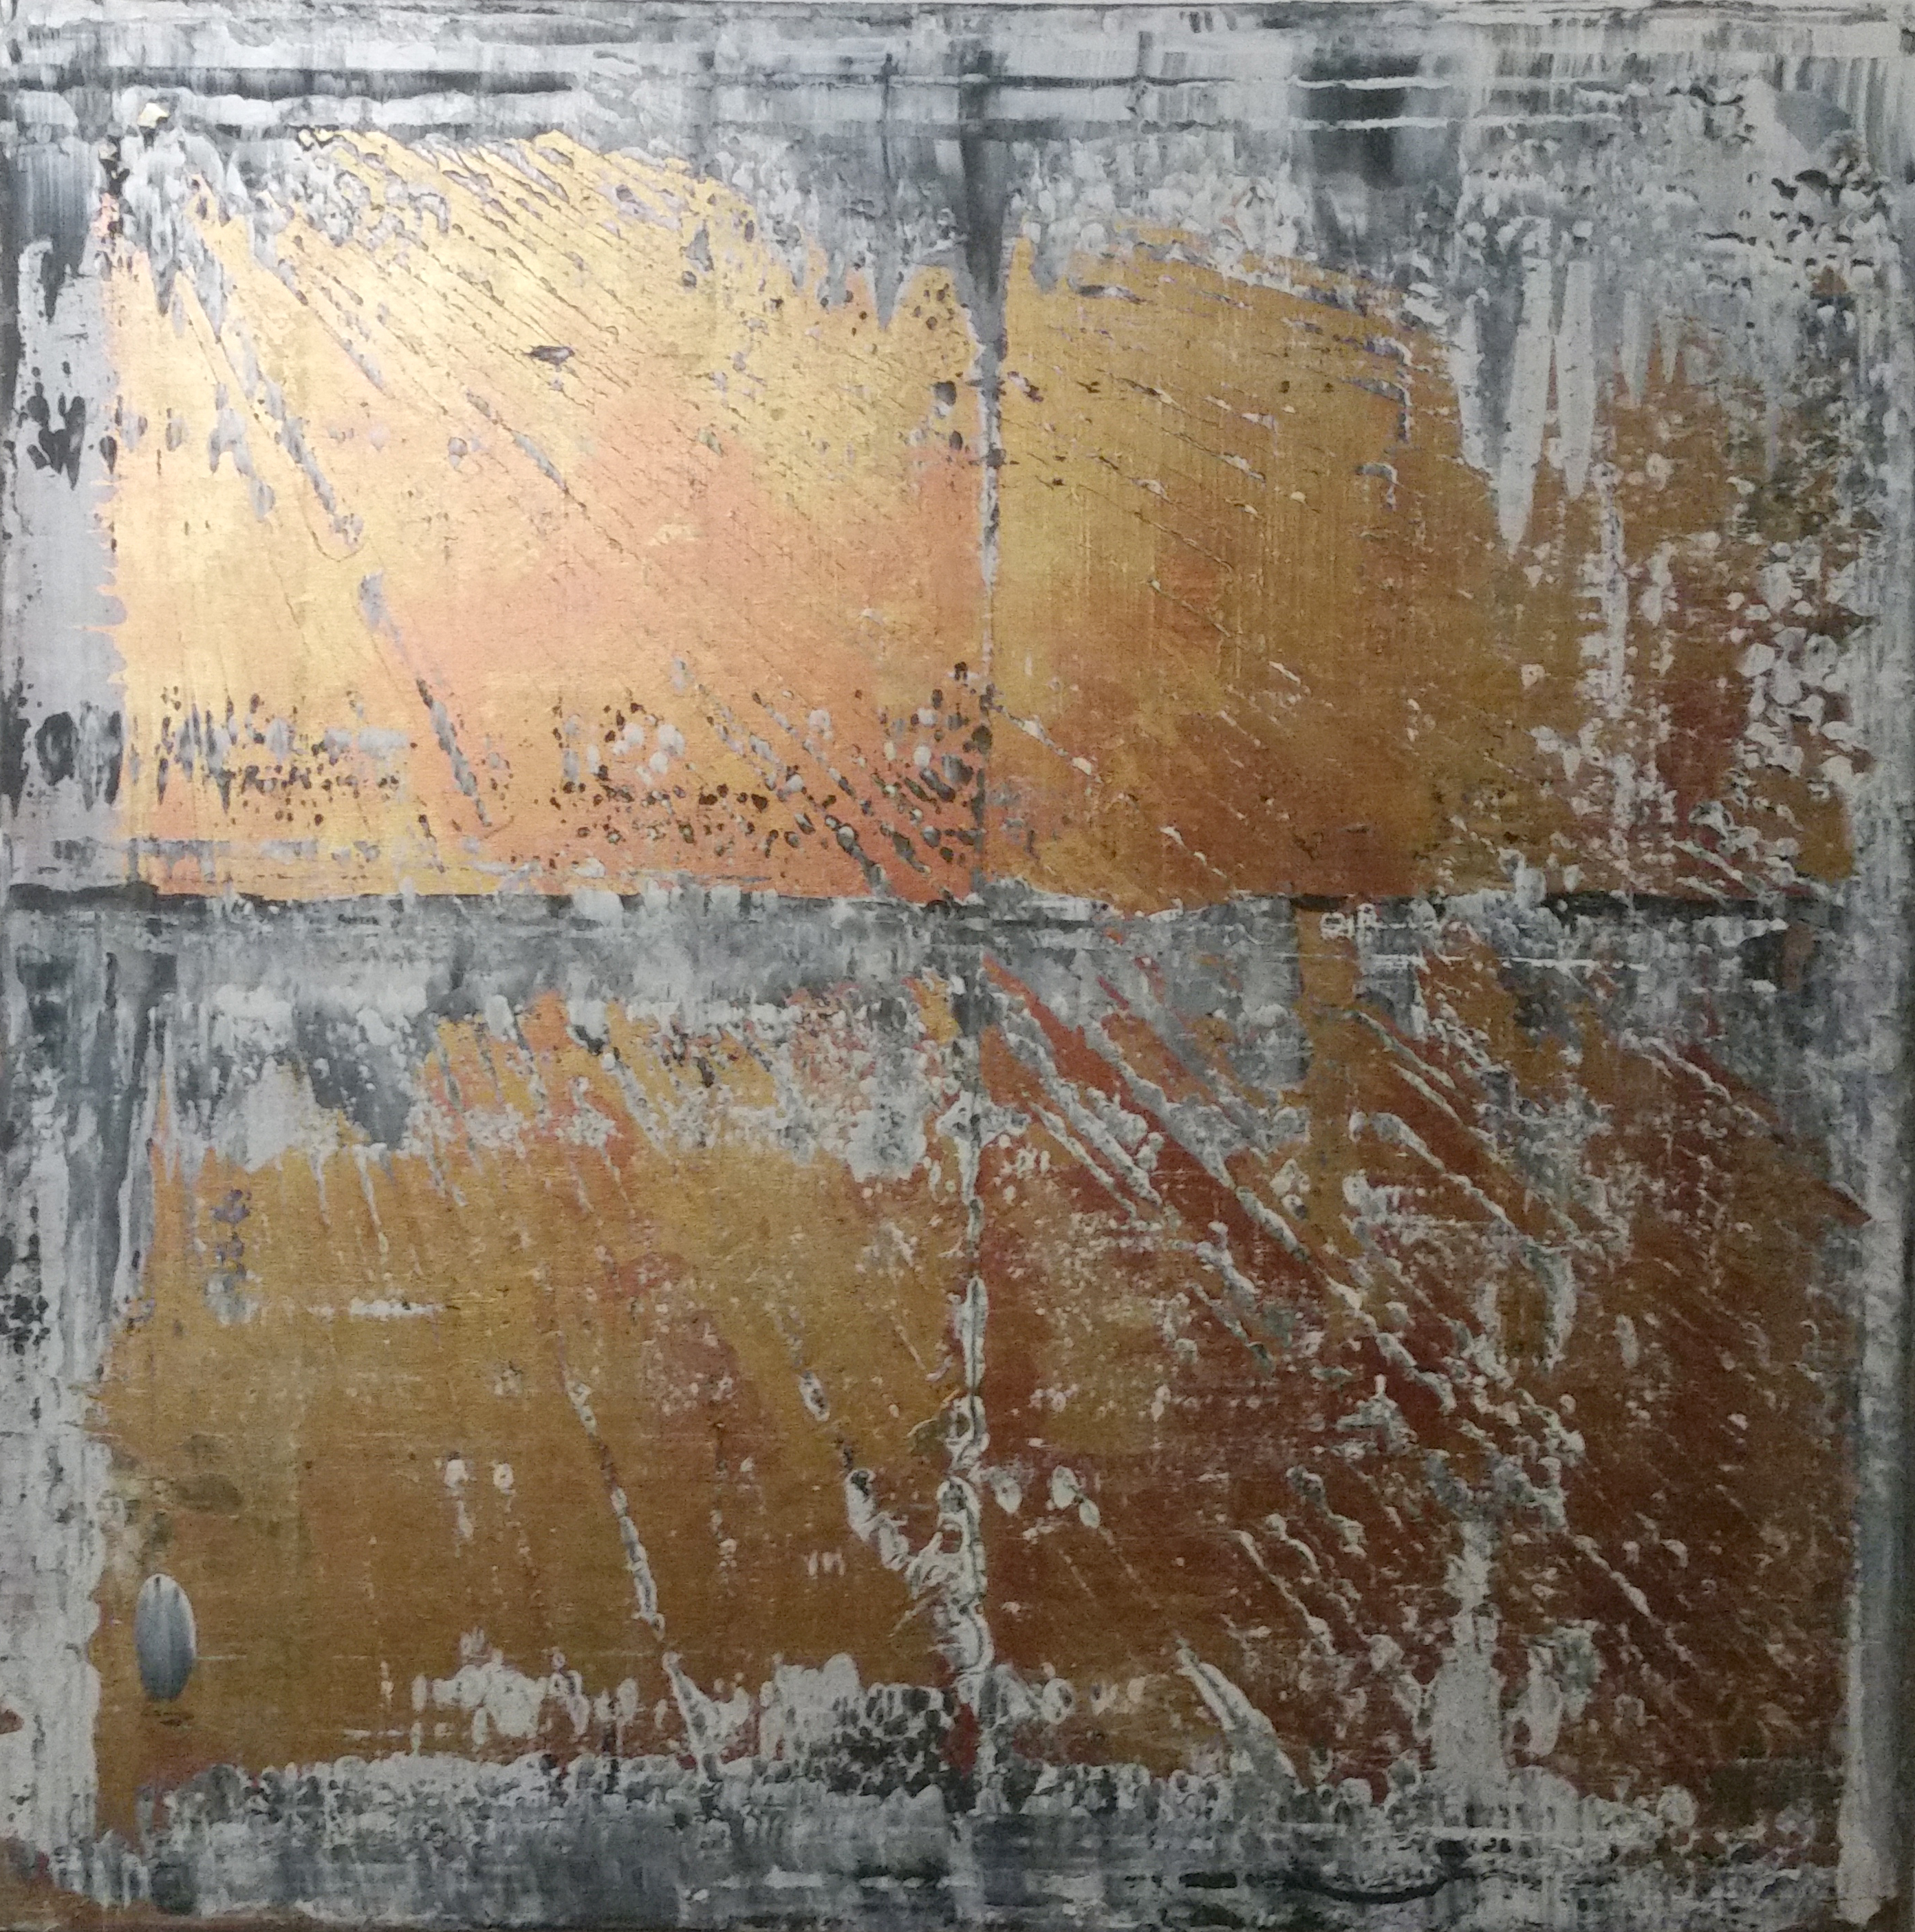 90 x 90 cm, Acryl auf Leinwand, Mischtechnik